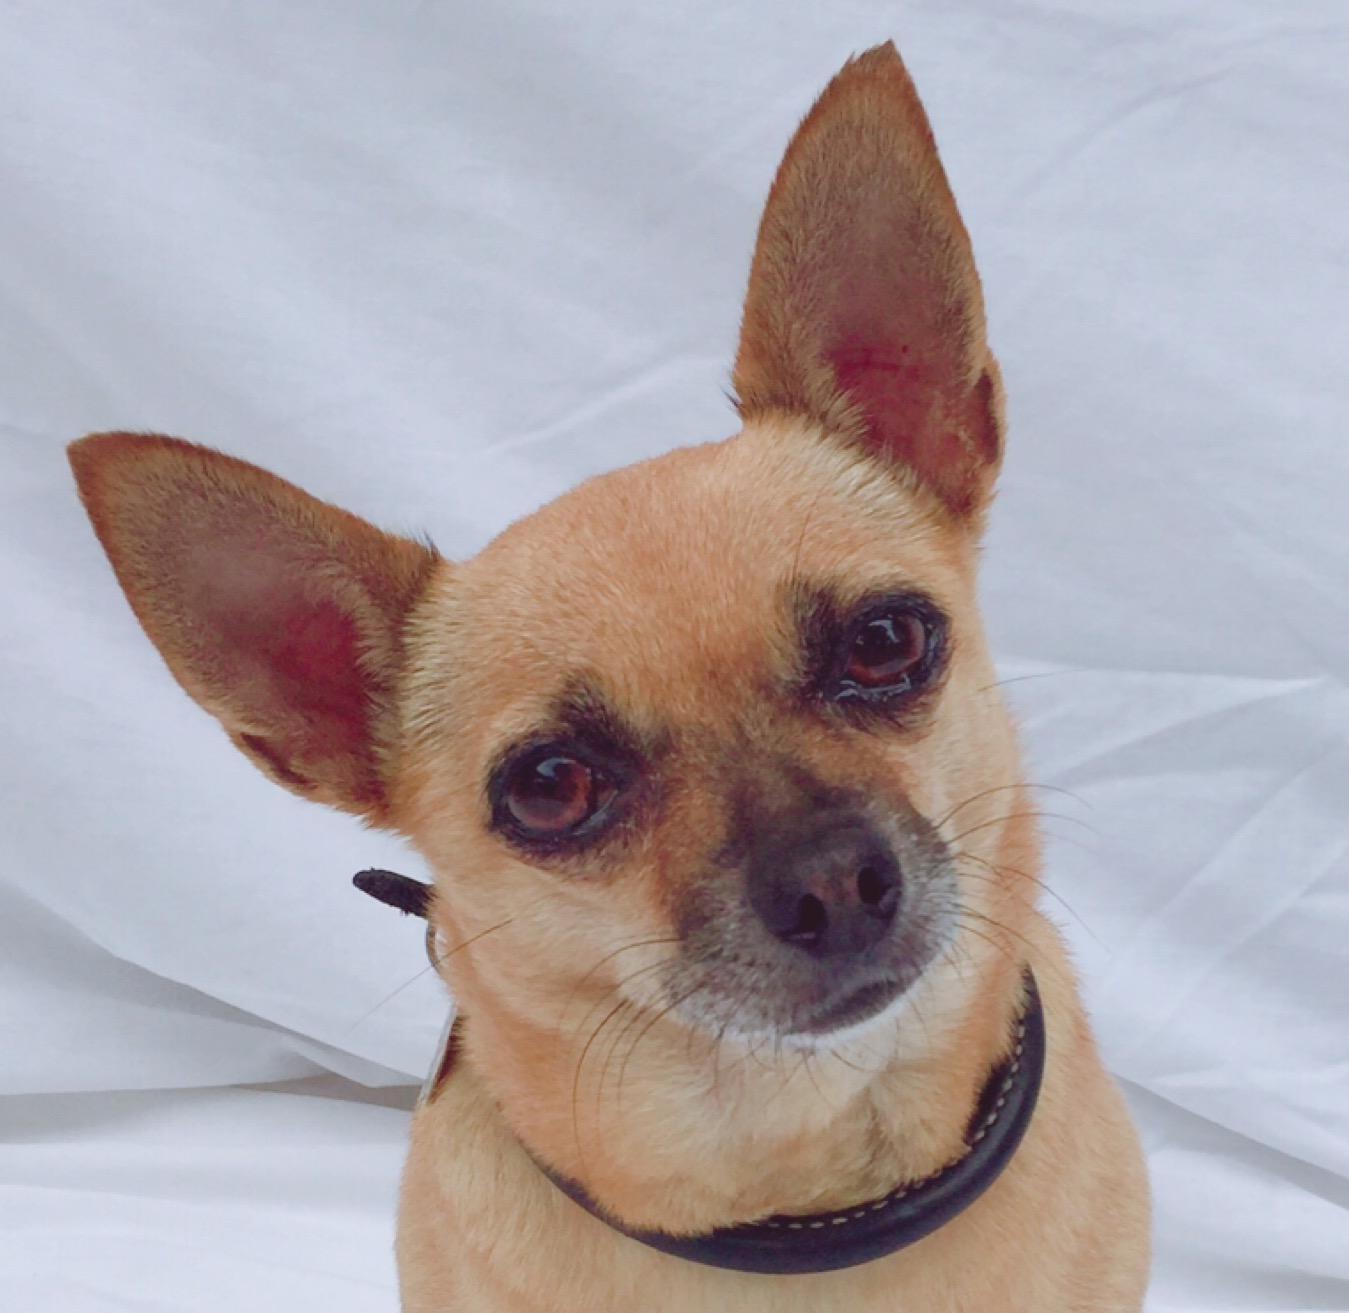 Chikis dog